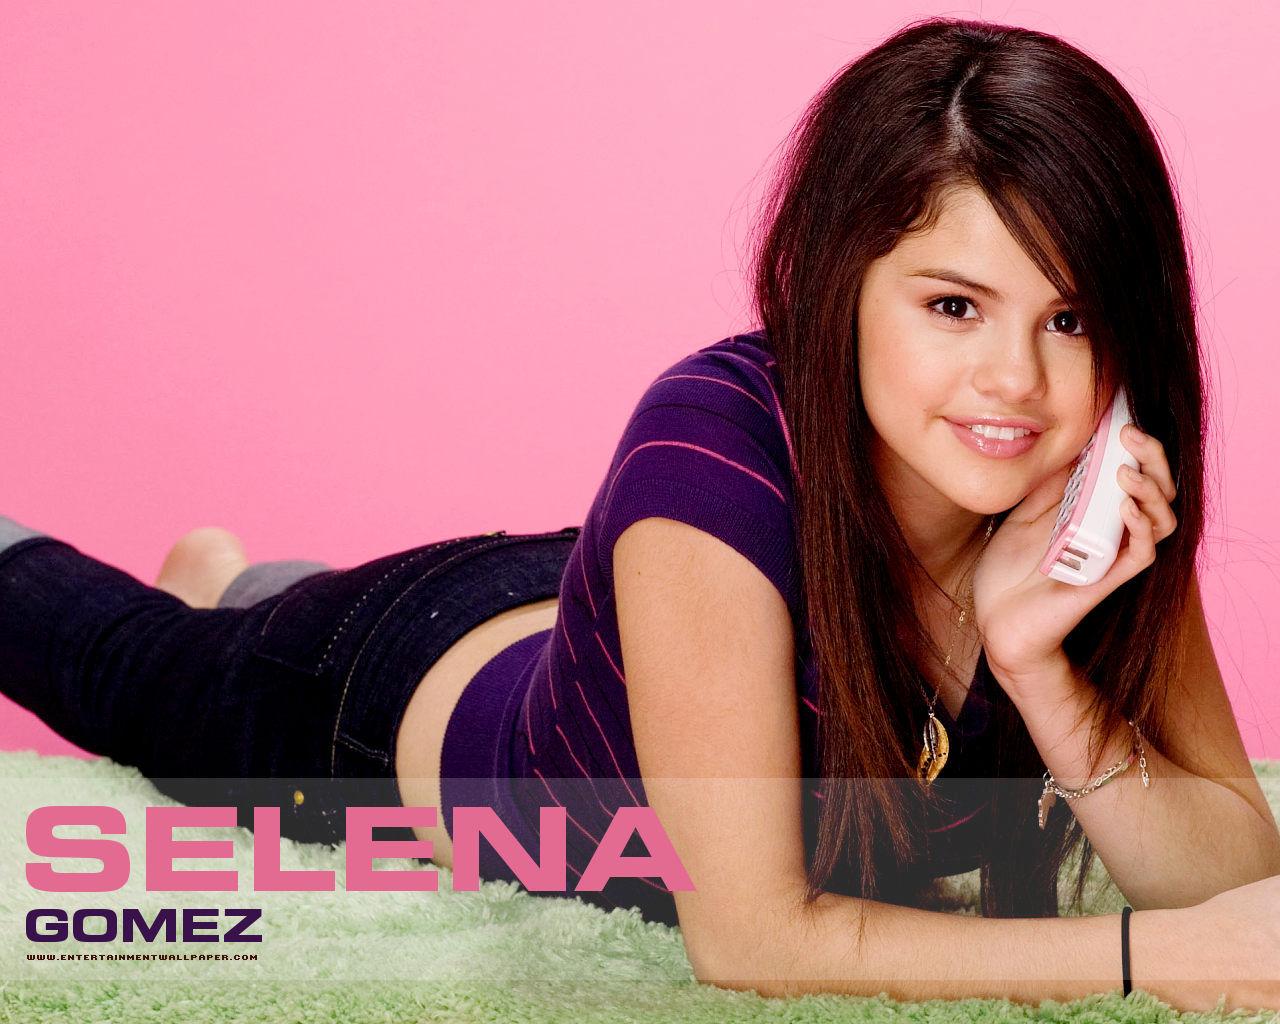 Selena Gomez Wallpapers   HD Wallpaper 1280x1024